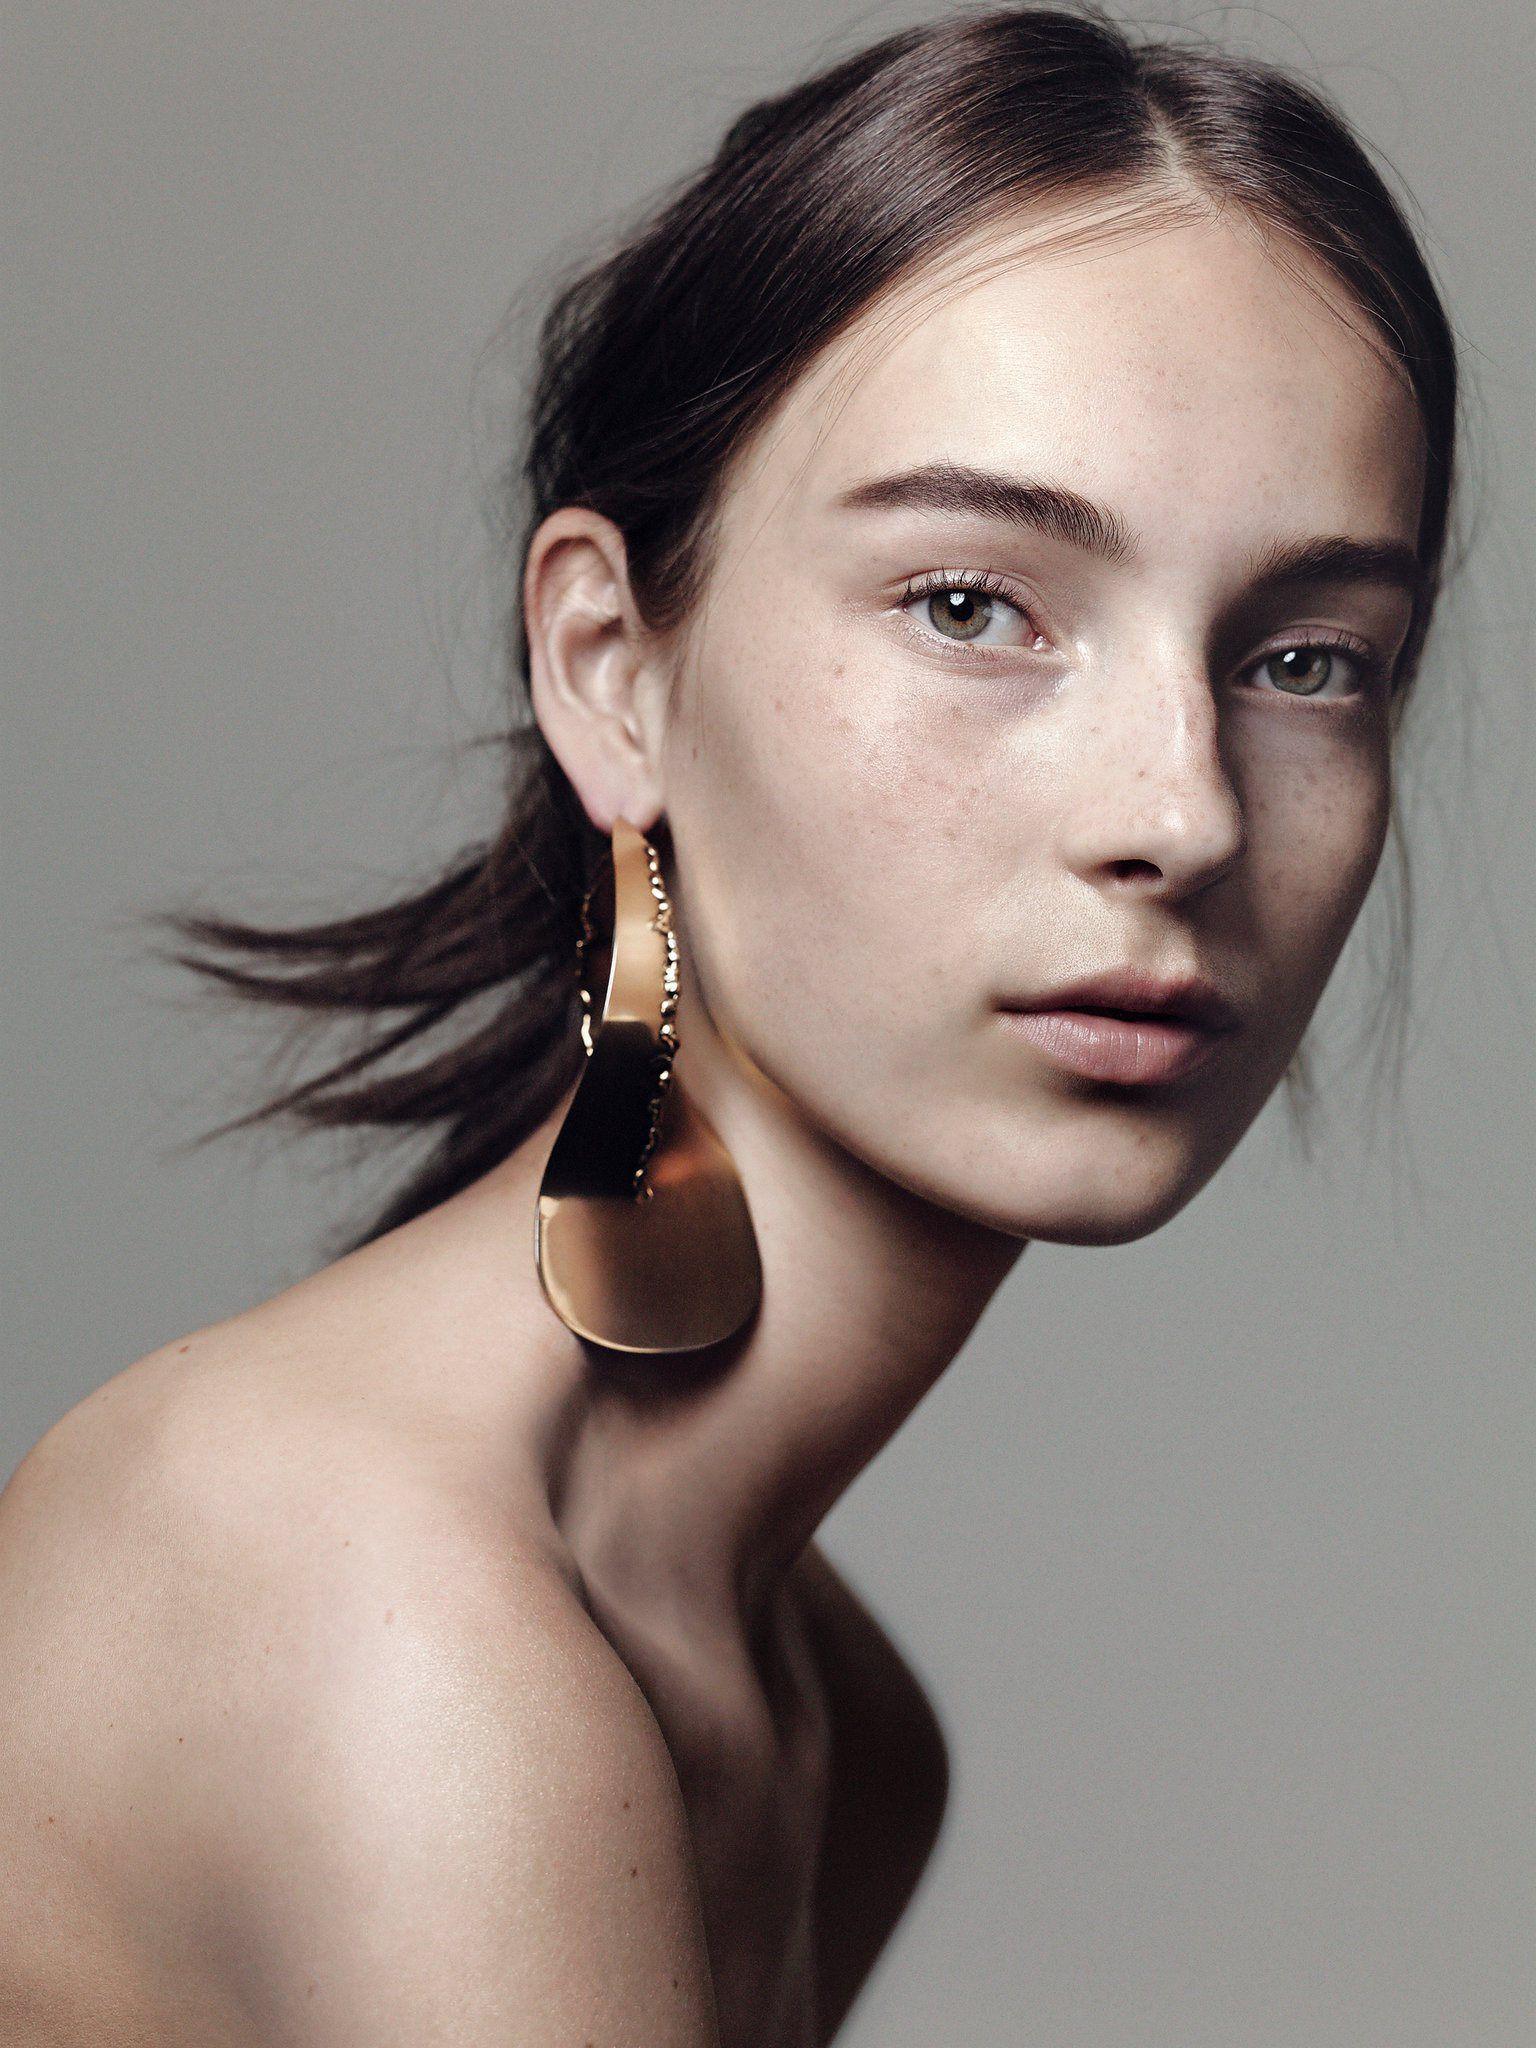 Communication on this topic: Victoria Hopper, flavia-arcaro/